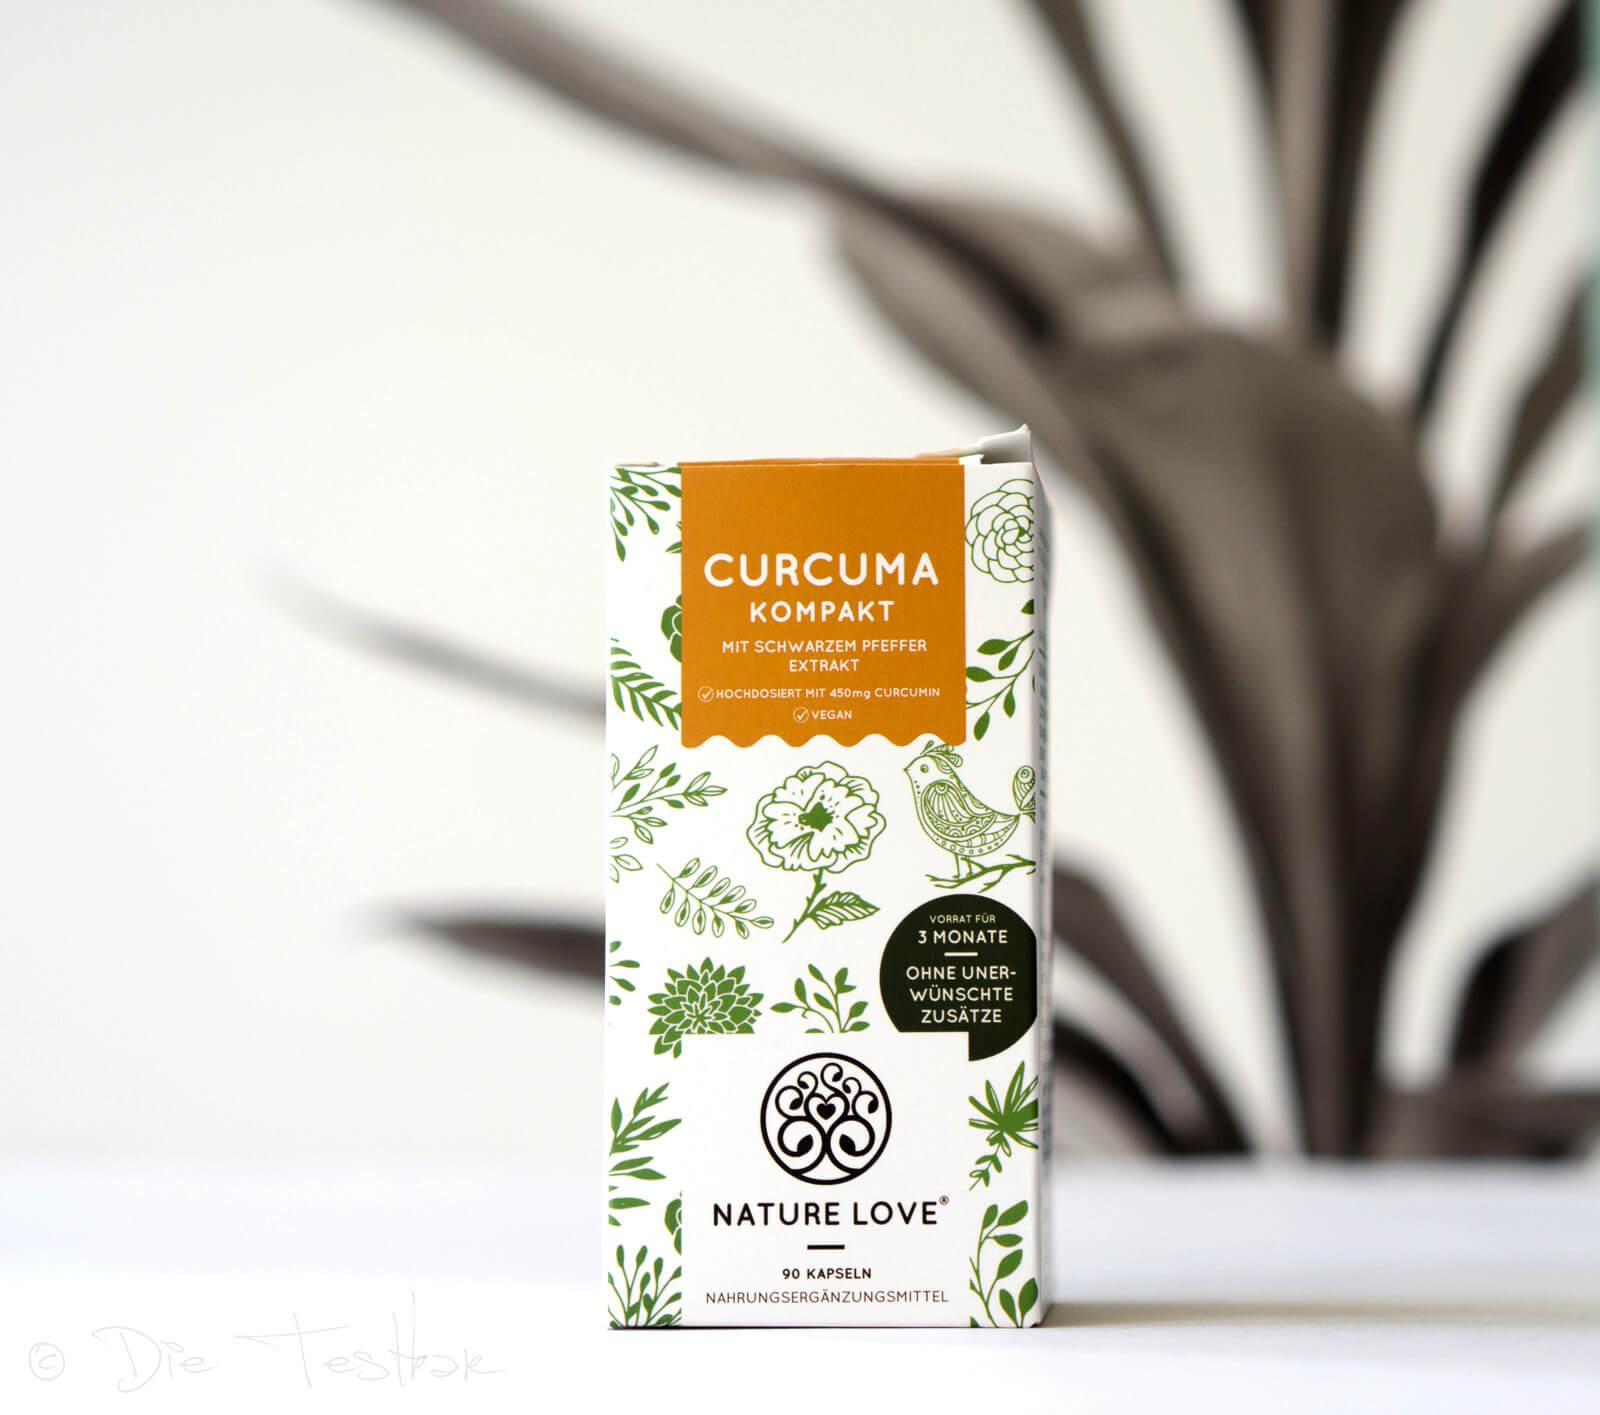 Curcuma Kompakt von Nature Love